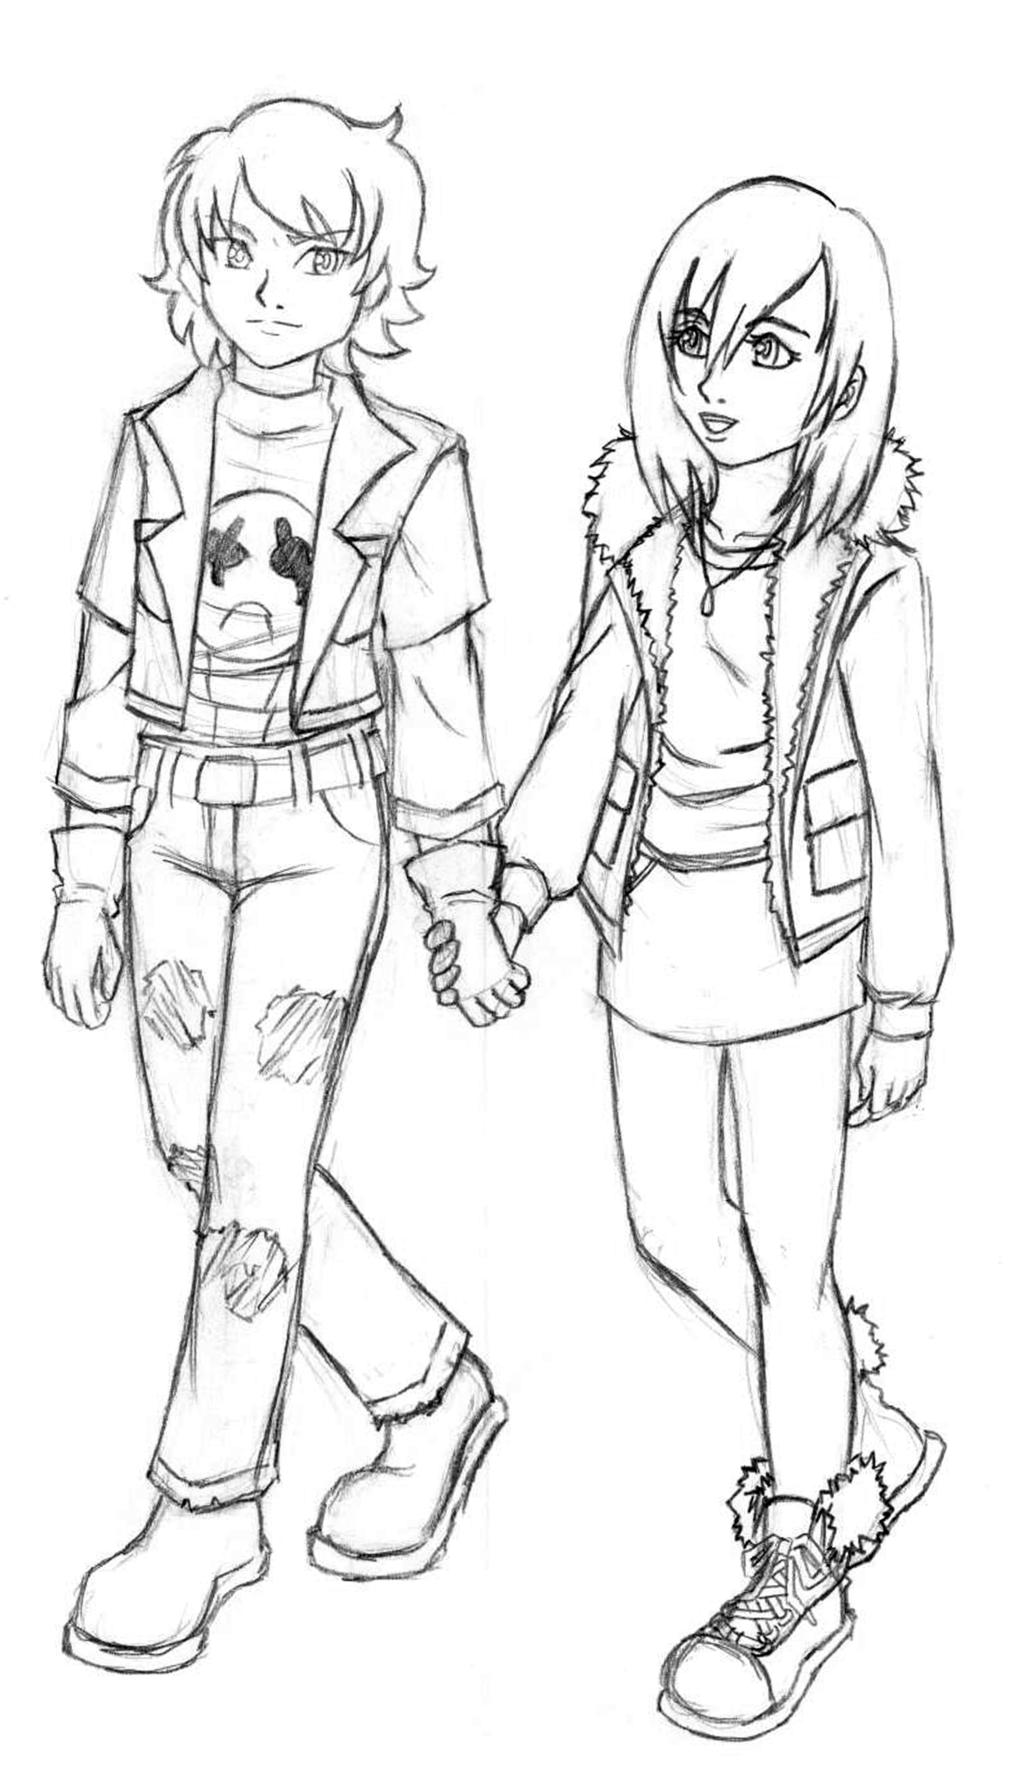 Zorhiria and Kairi